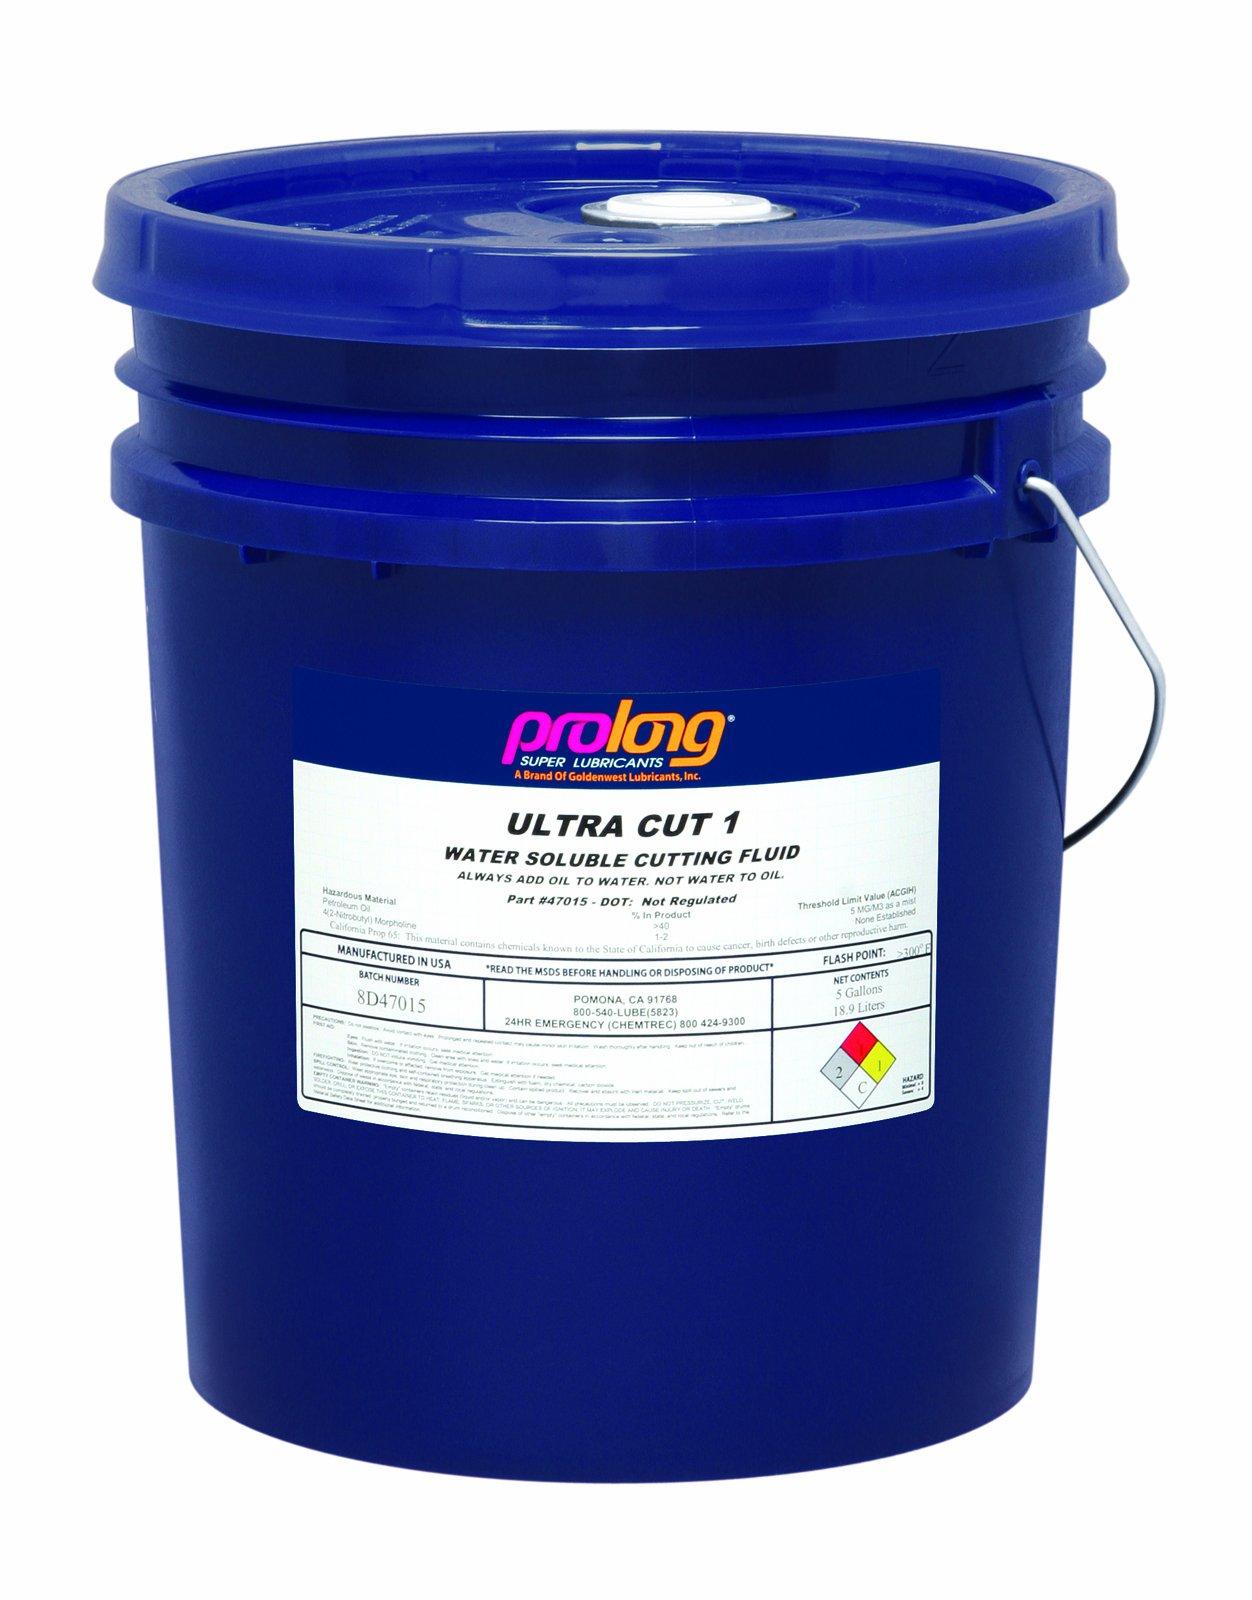 Prolong Super Lubricants PSL47015 Ultra Cut 1 Water Soluble Cutting Fluid - 5 Gallon